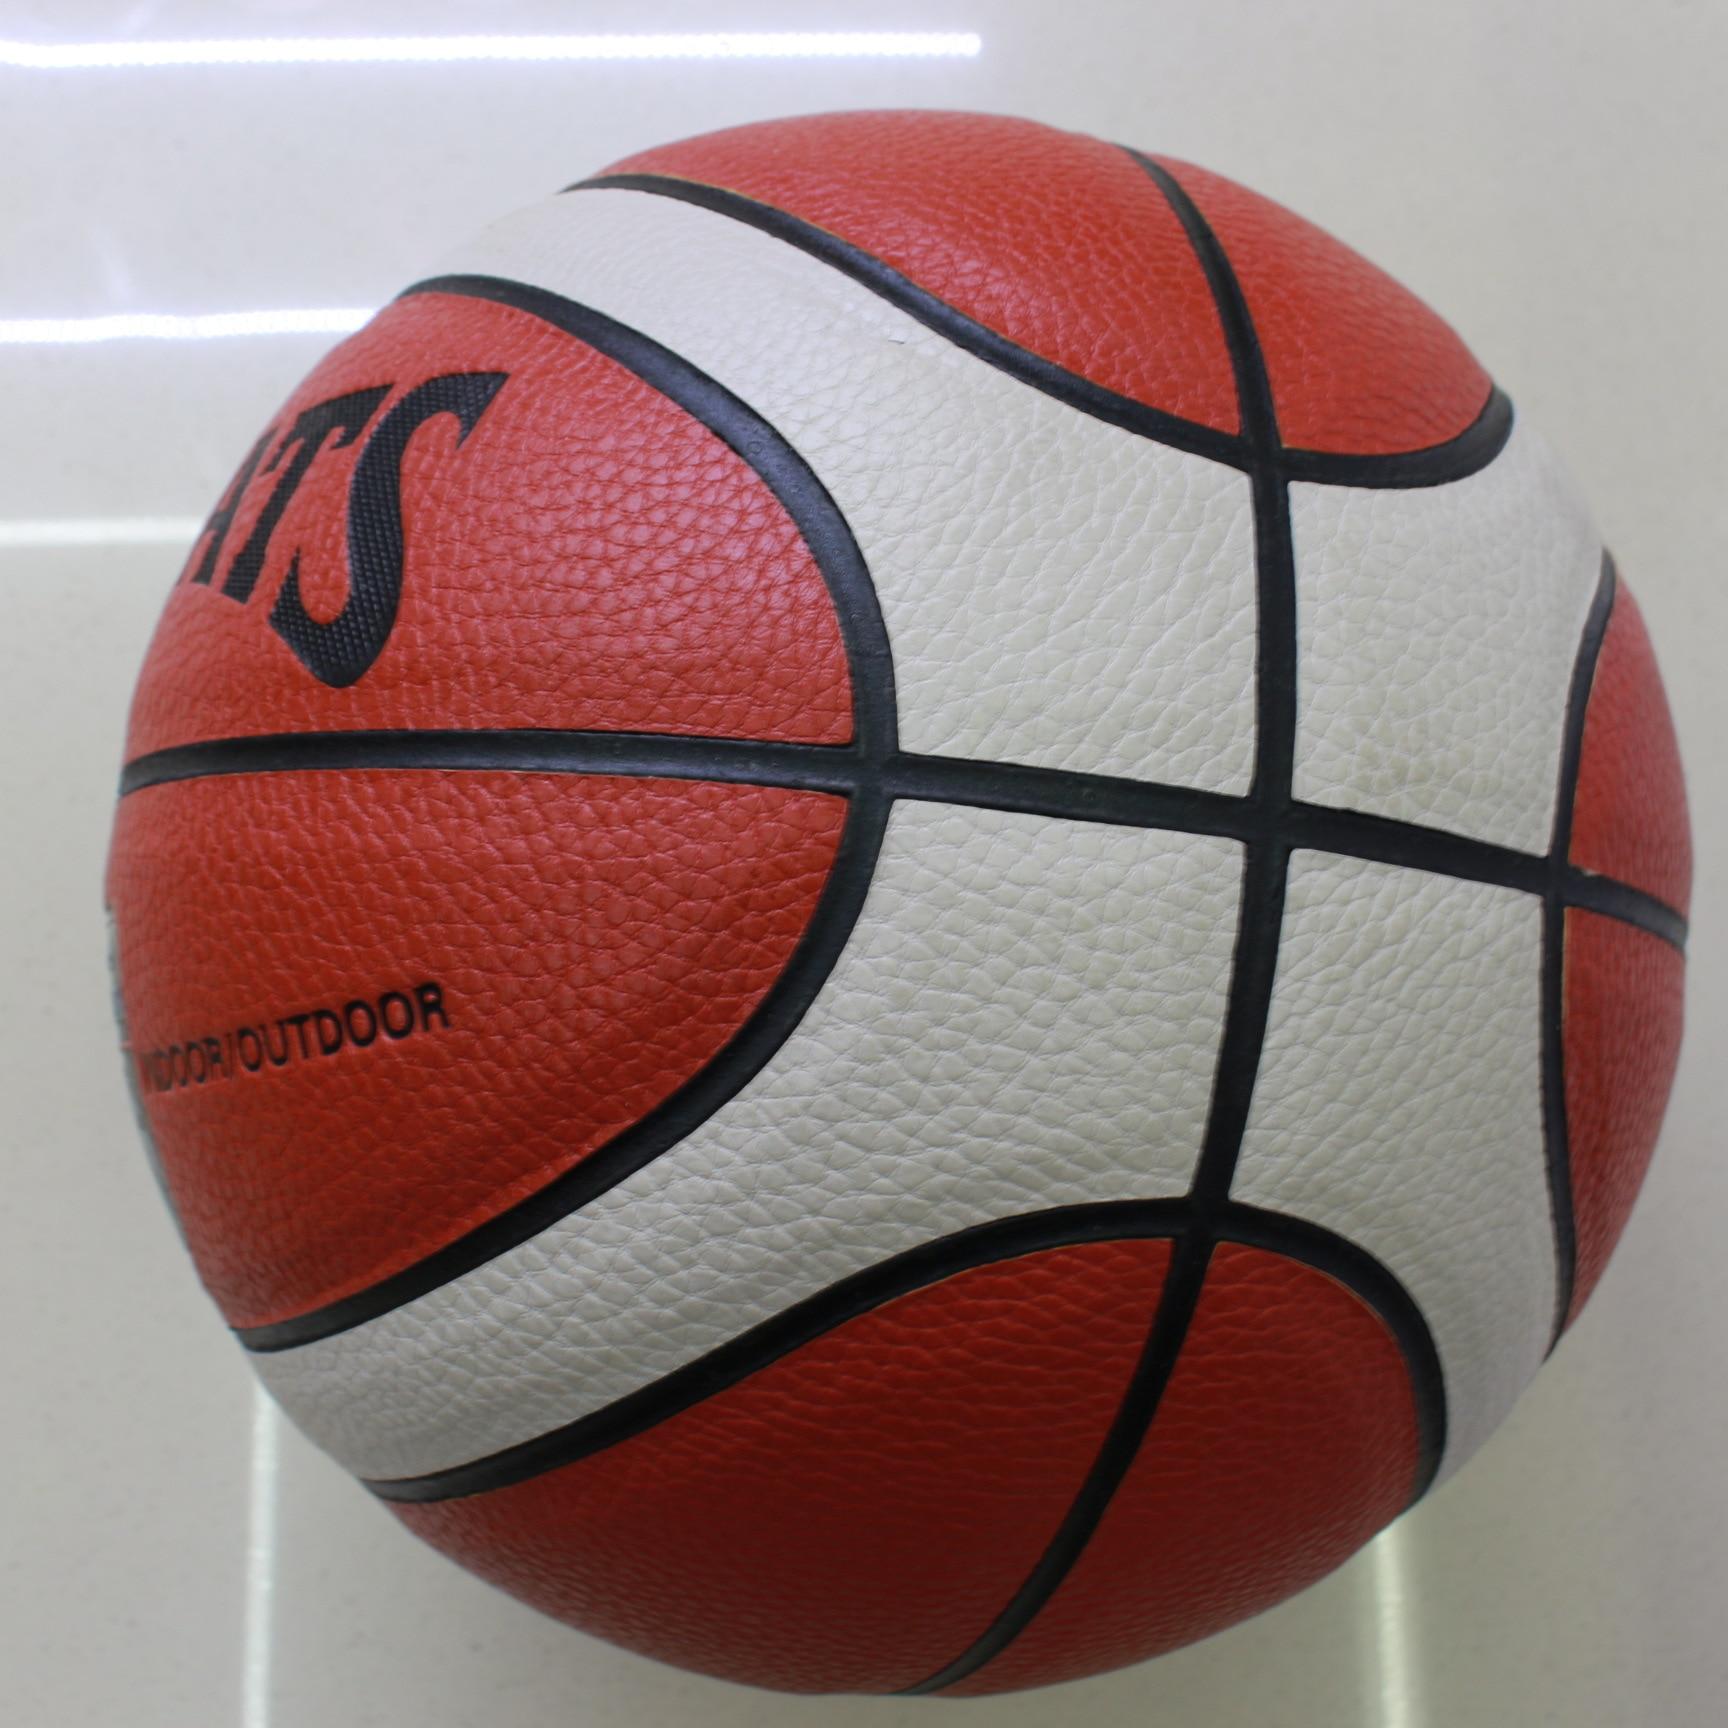 Basketball ball PU material size 7 basketball club ball,outdoor indoor professional game training men and women basketball ball